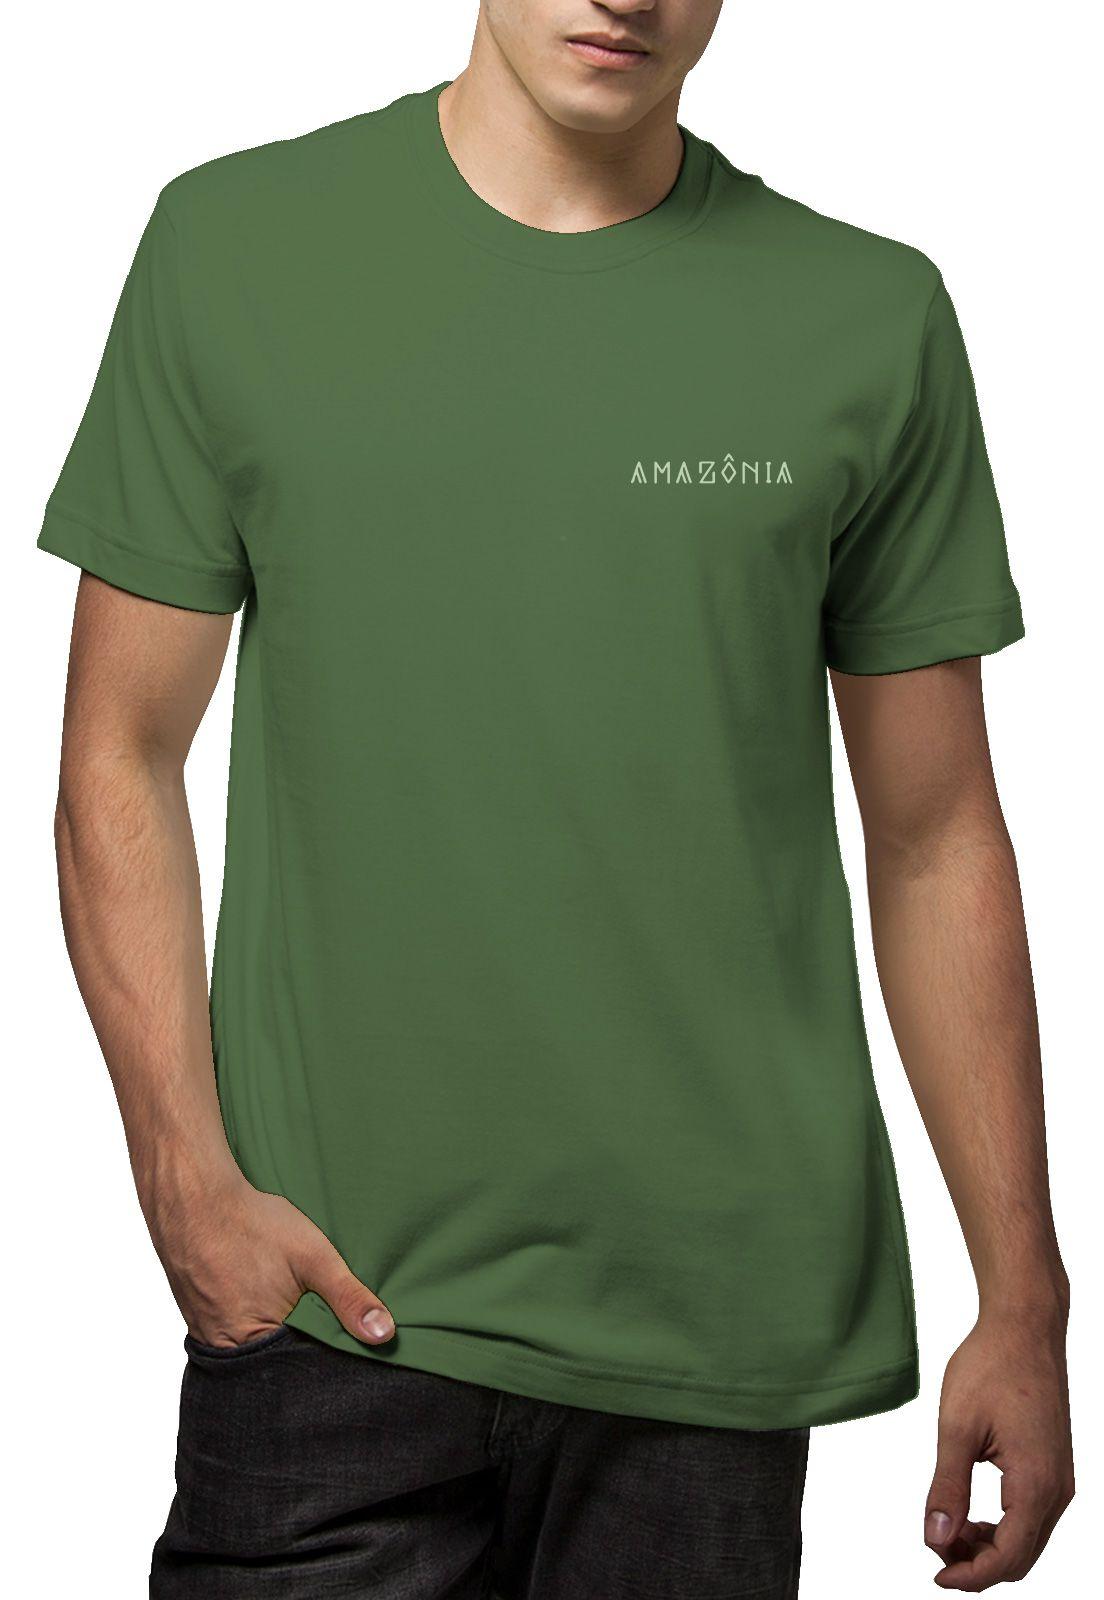 Camiseta Amazônia Biodiversidade - Verde Escuro